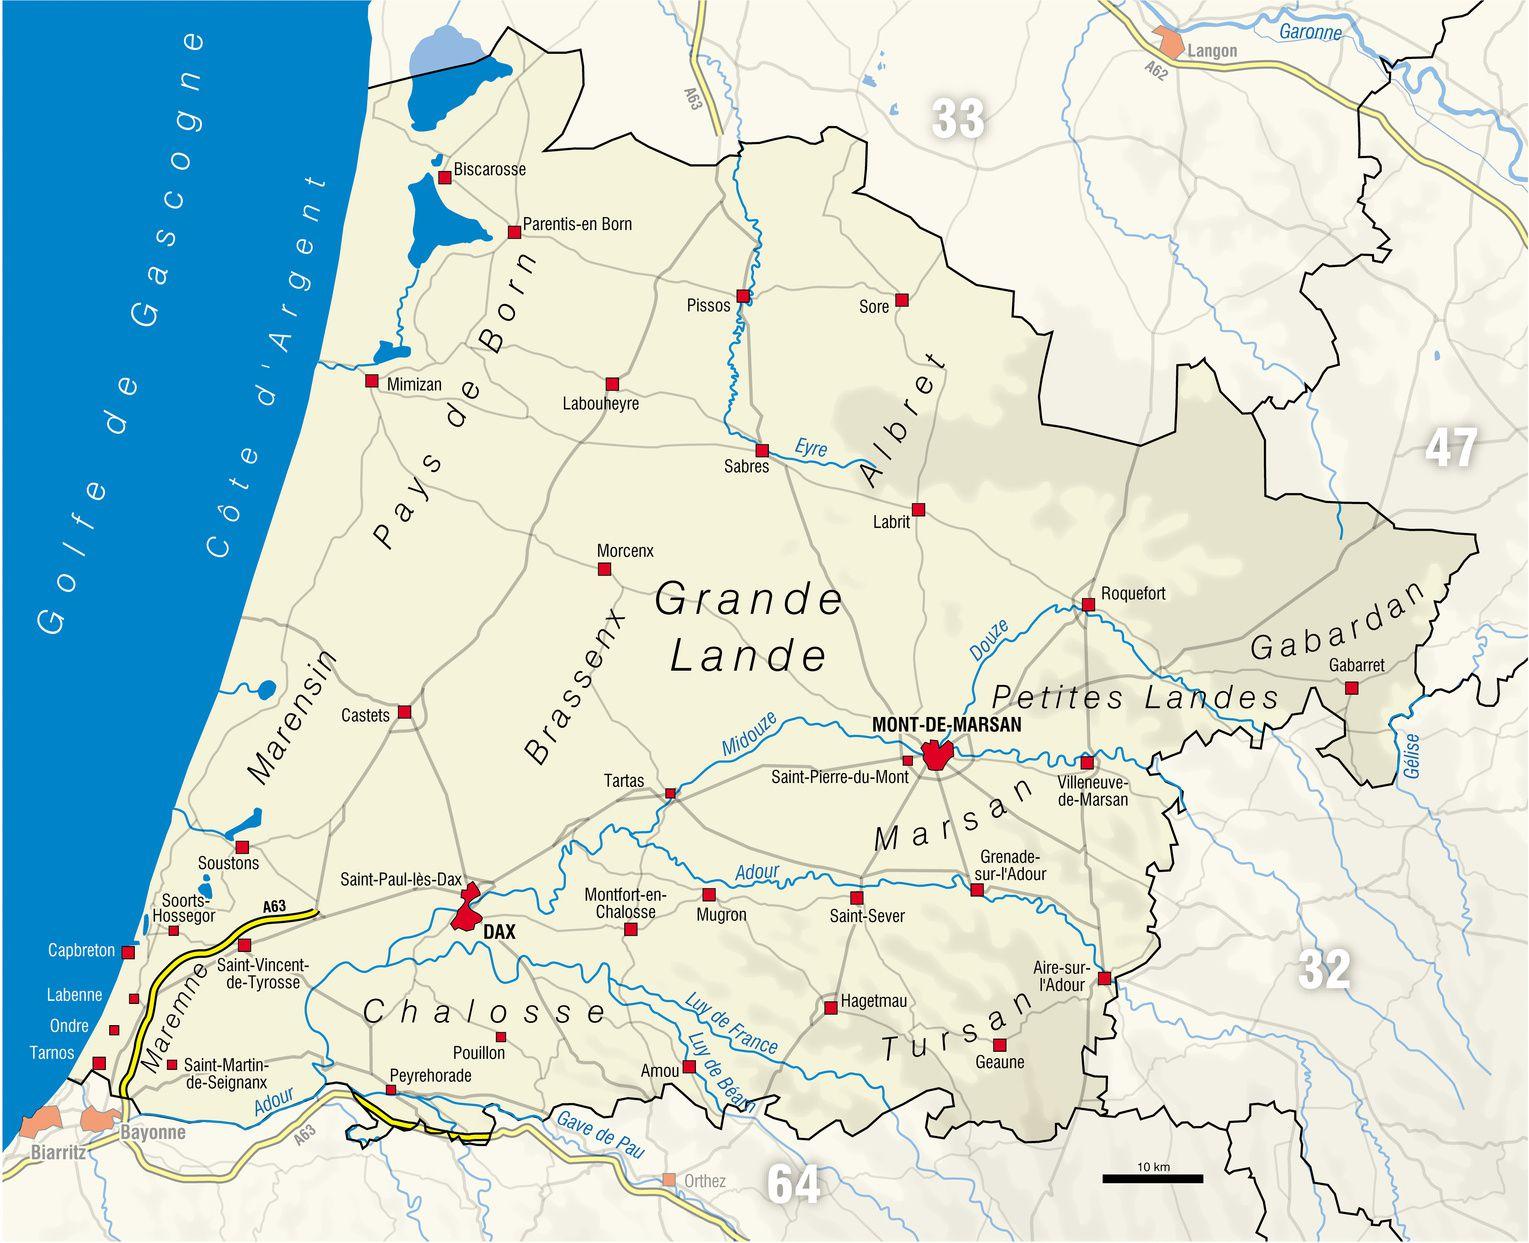 Carte des Landes